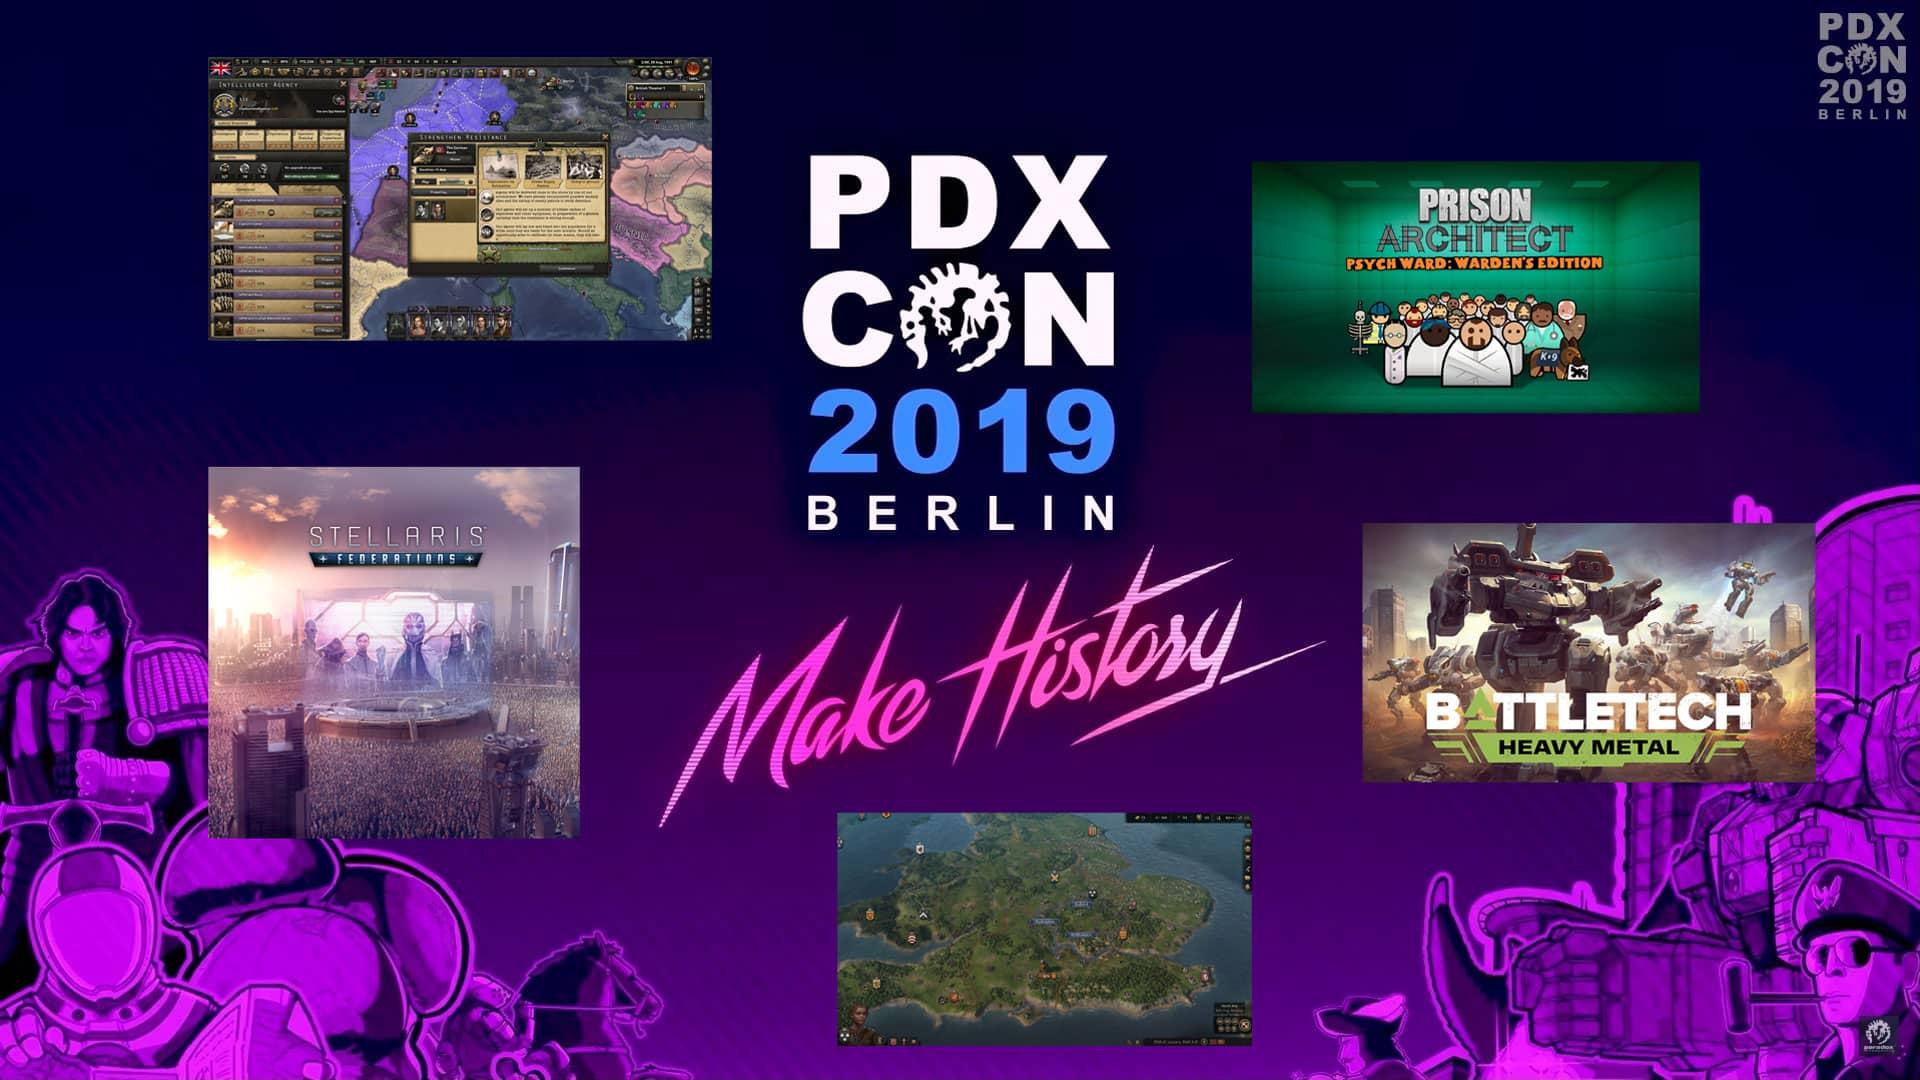 Pdxcon 2019 ankündigungen